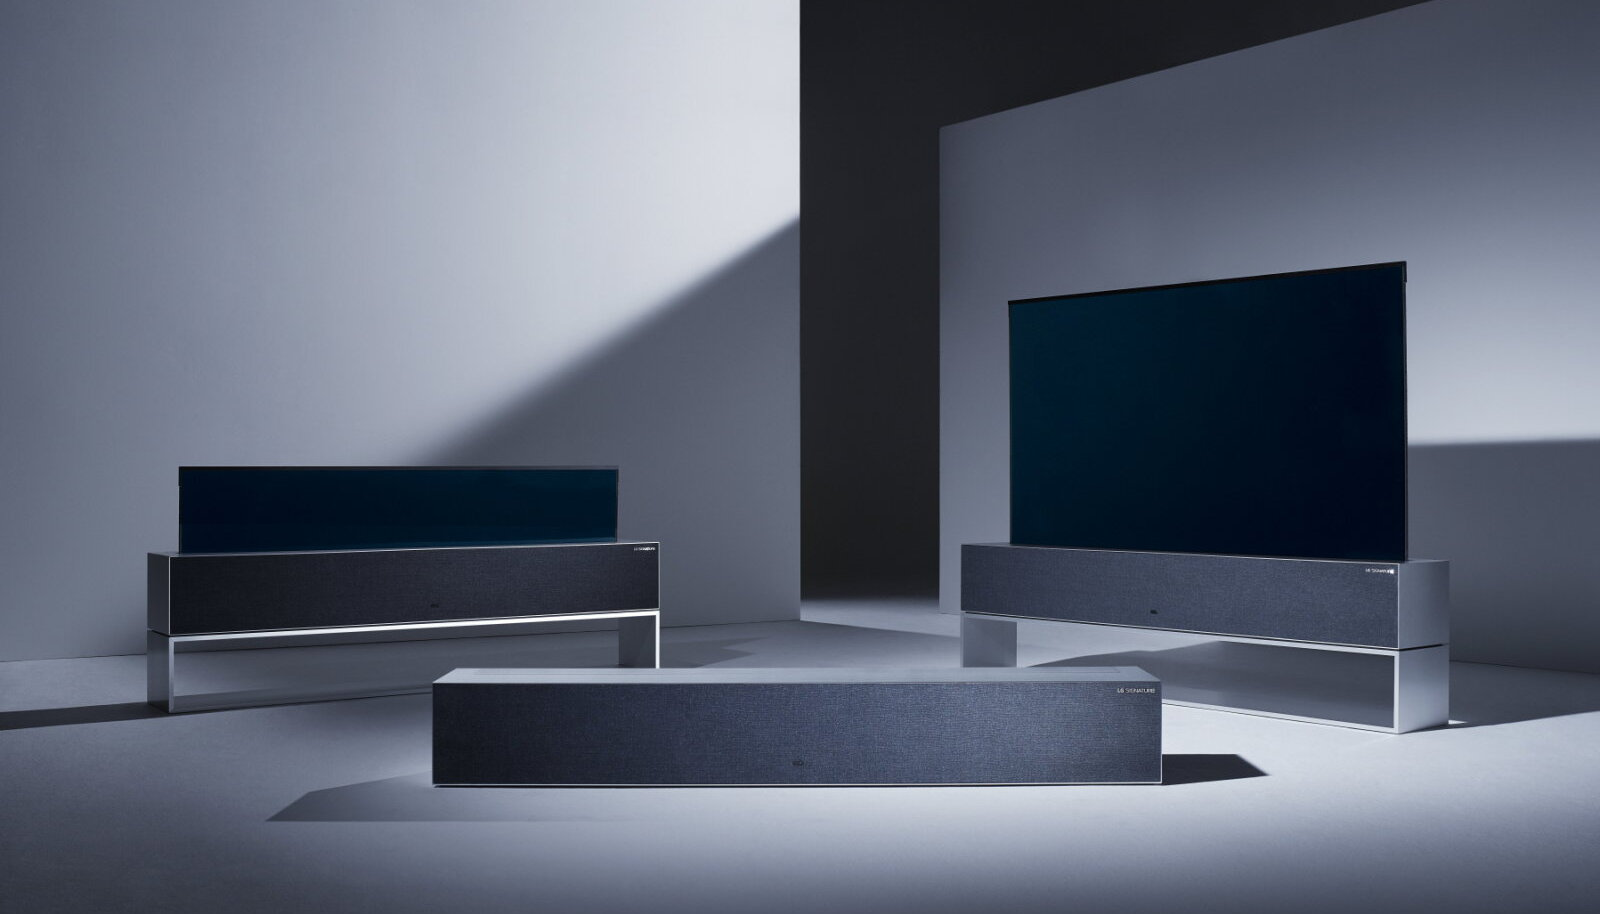 LG uus kokkurullitav teler ja selle kolm erinevat asendit